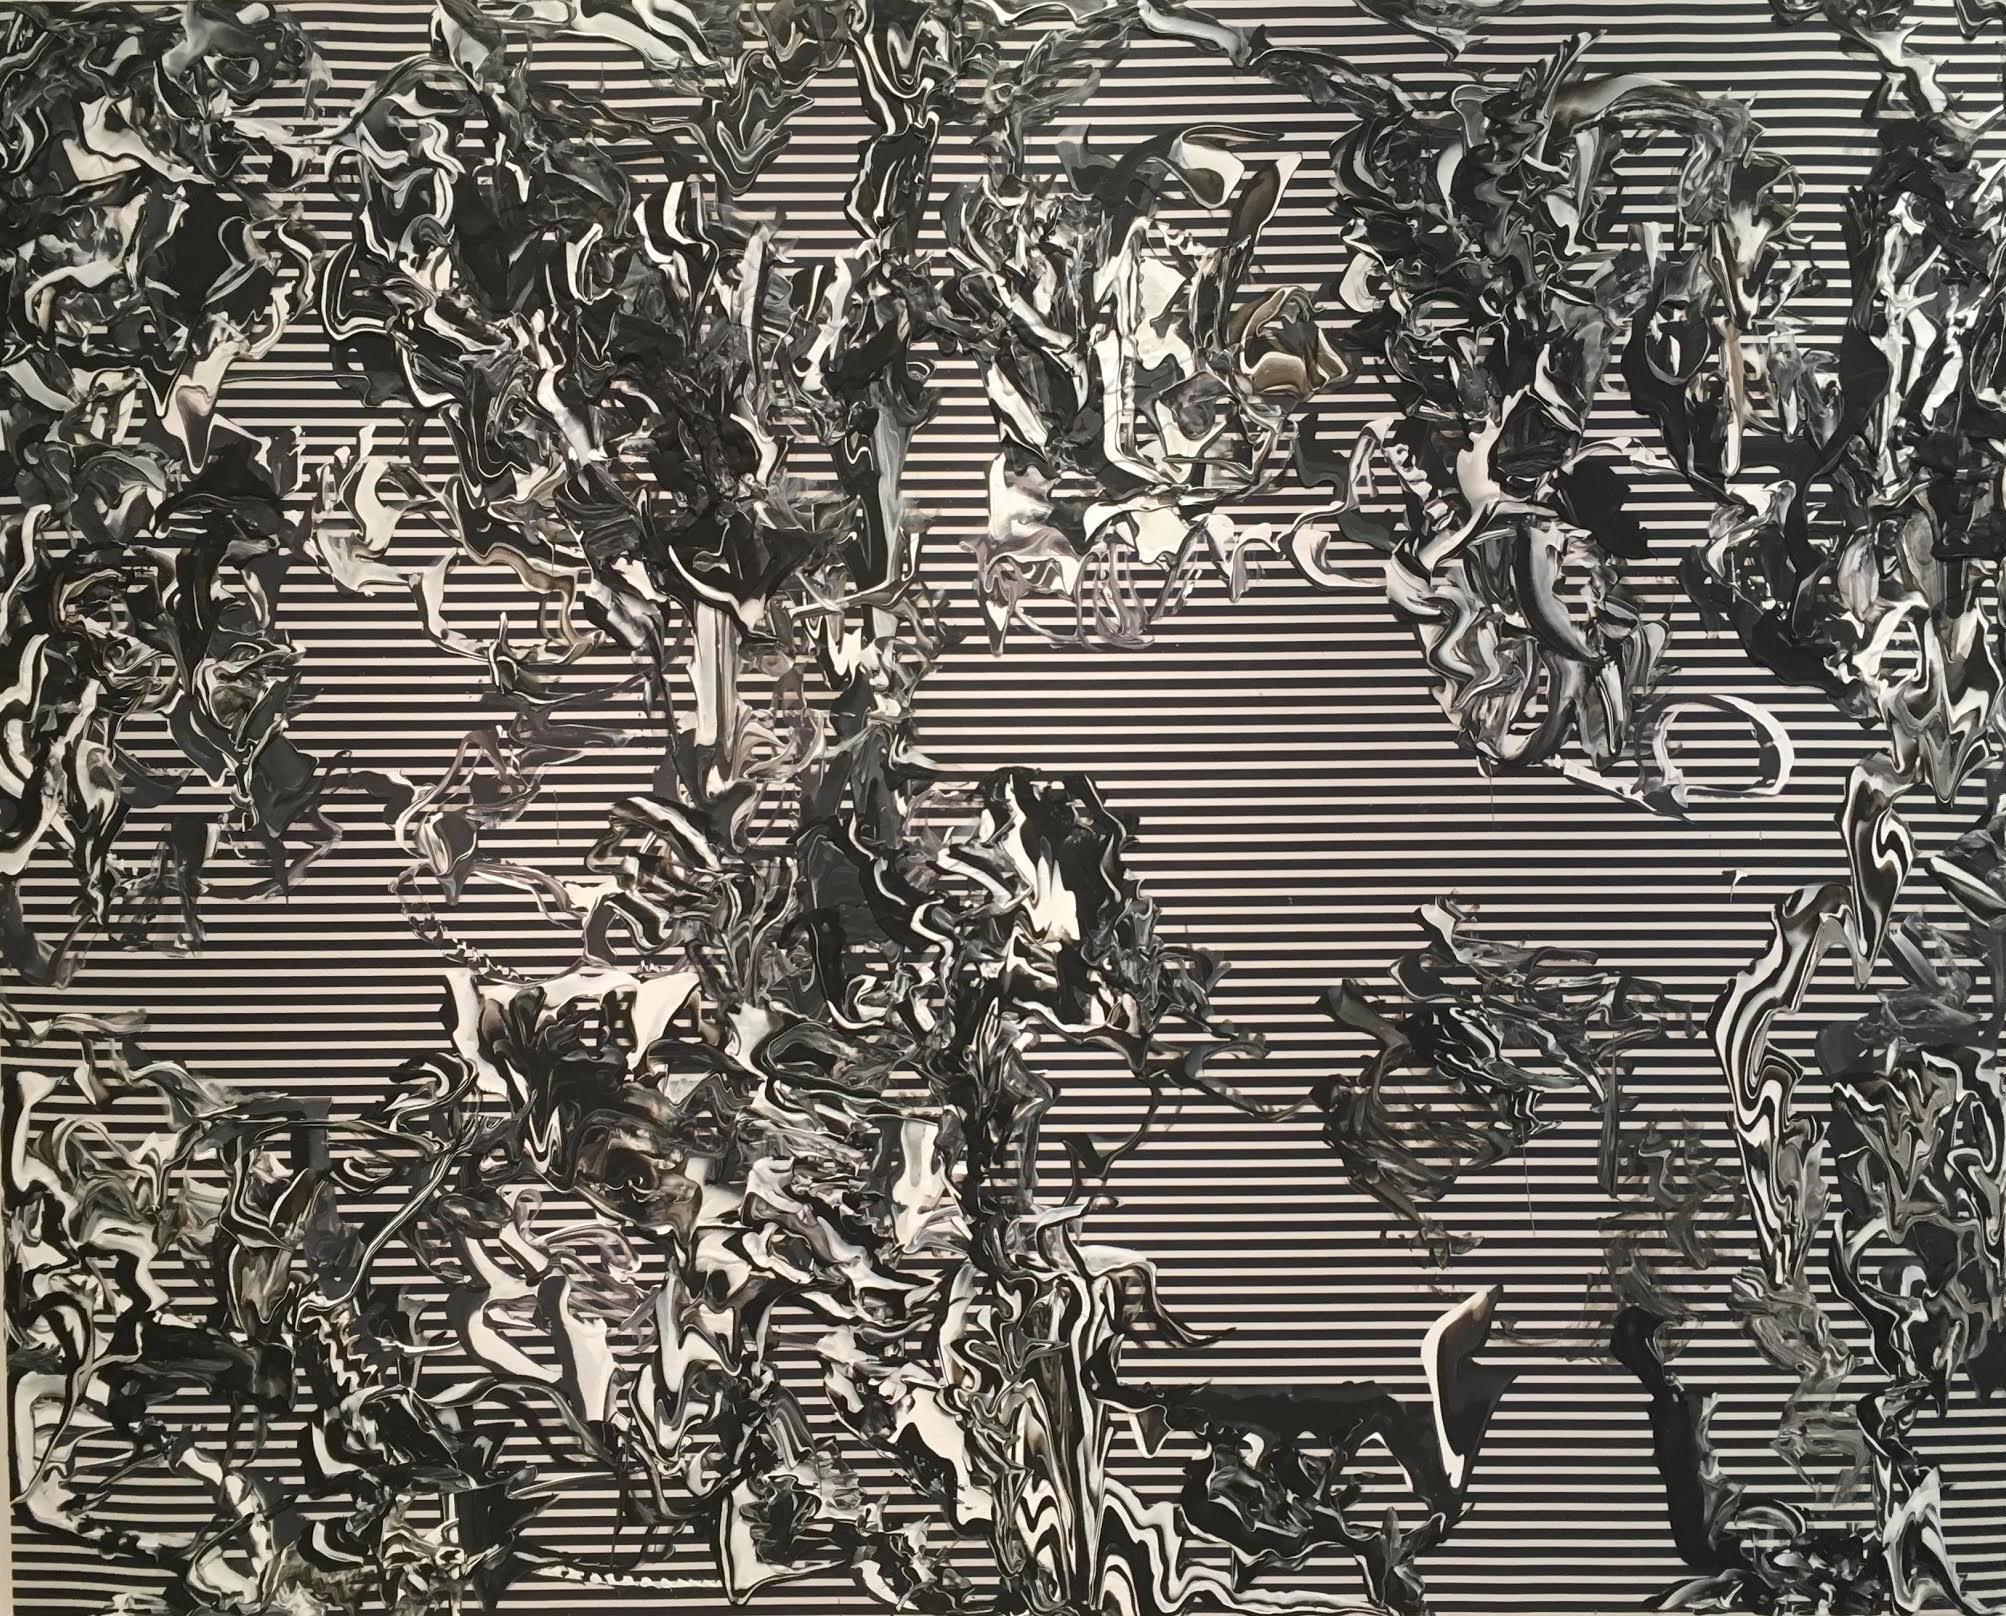 Peter Fox,Untitled (Origins), 2017, 50 x 62, Acrylic on canvas